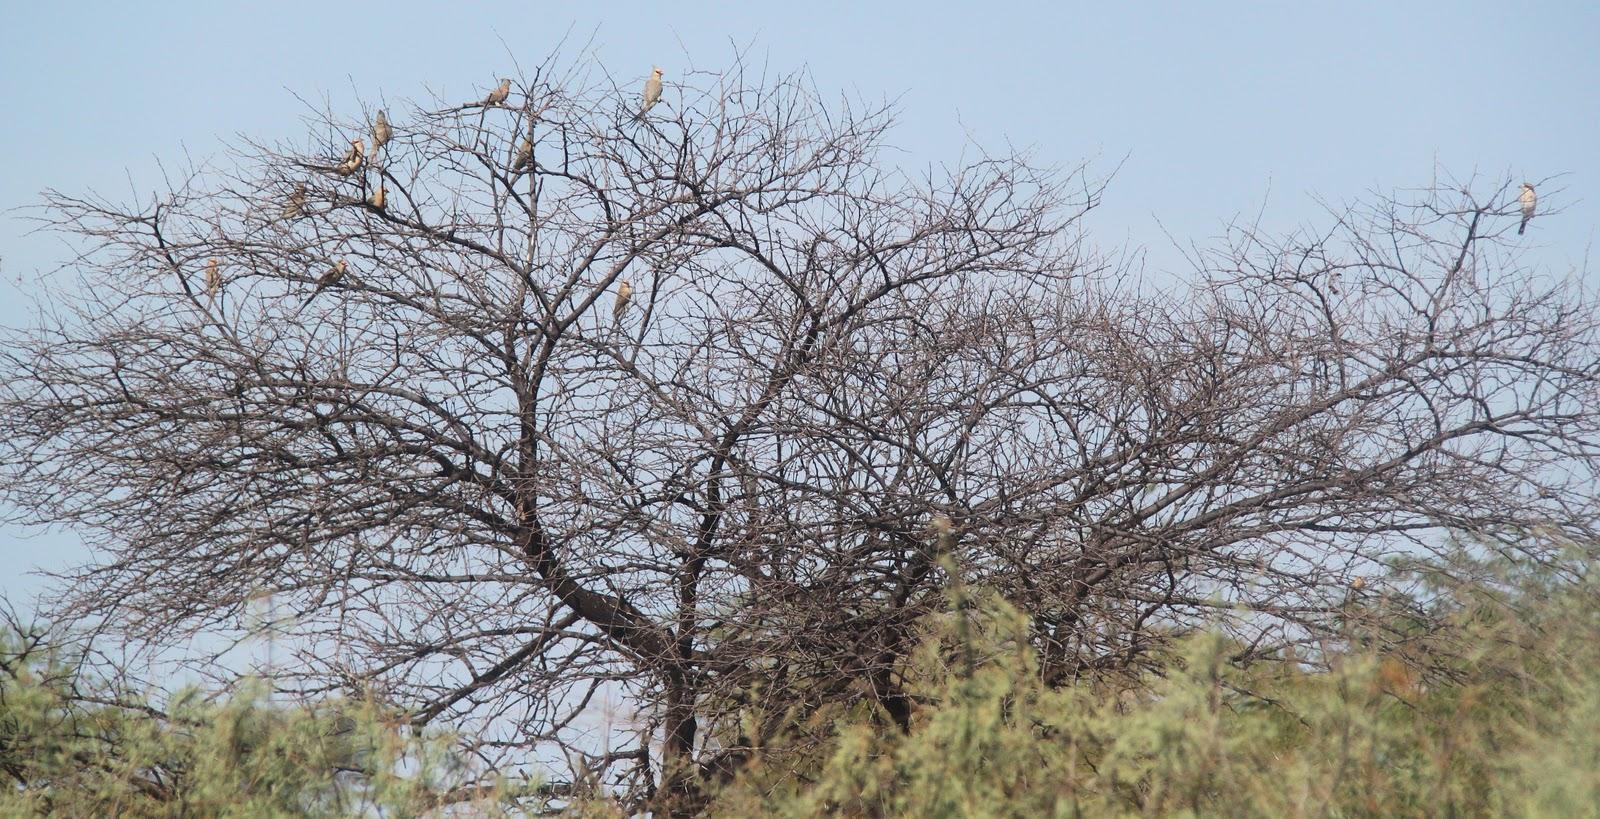 ornithondar